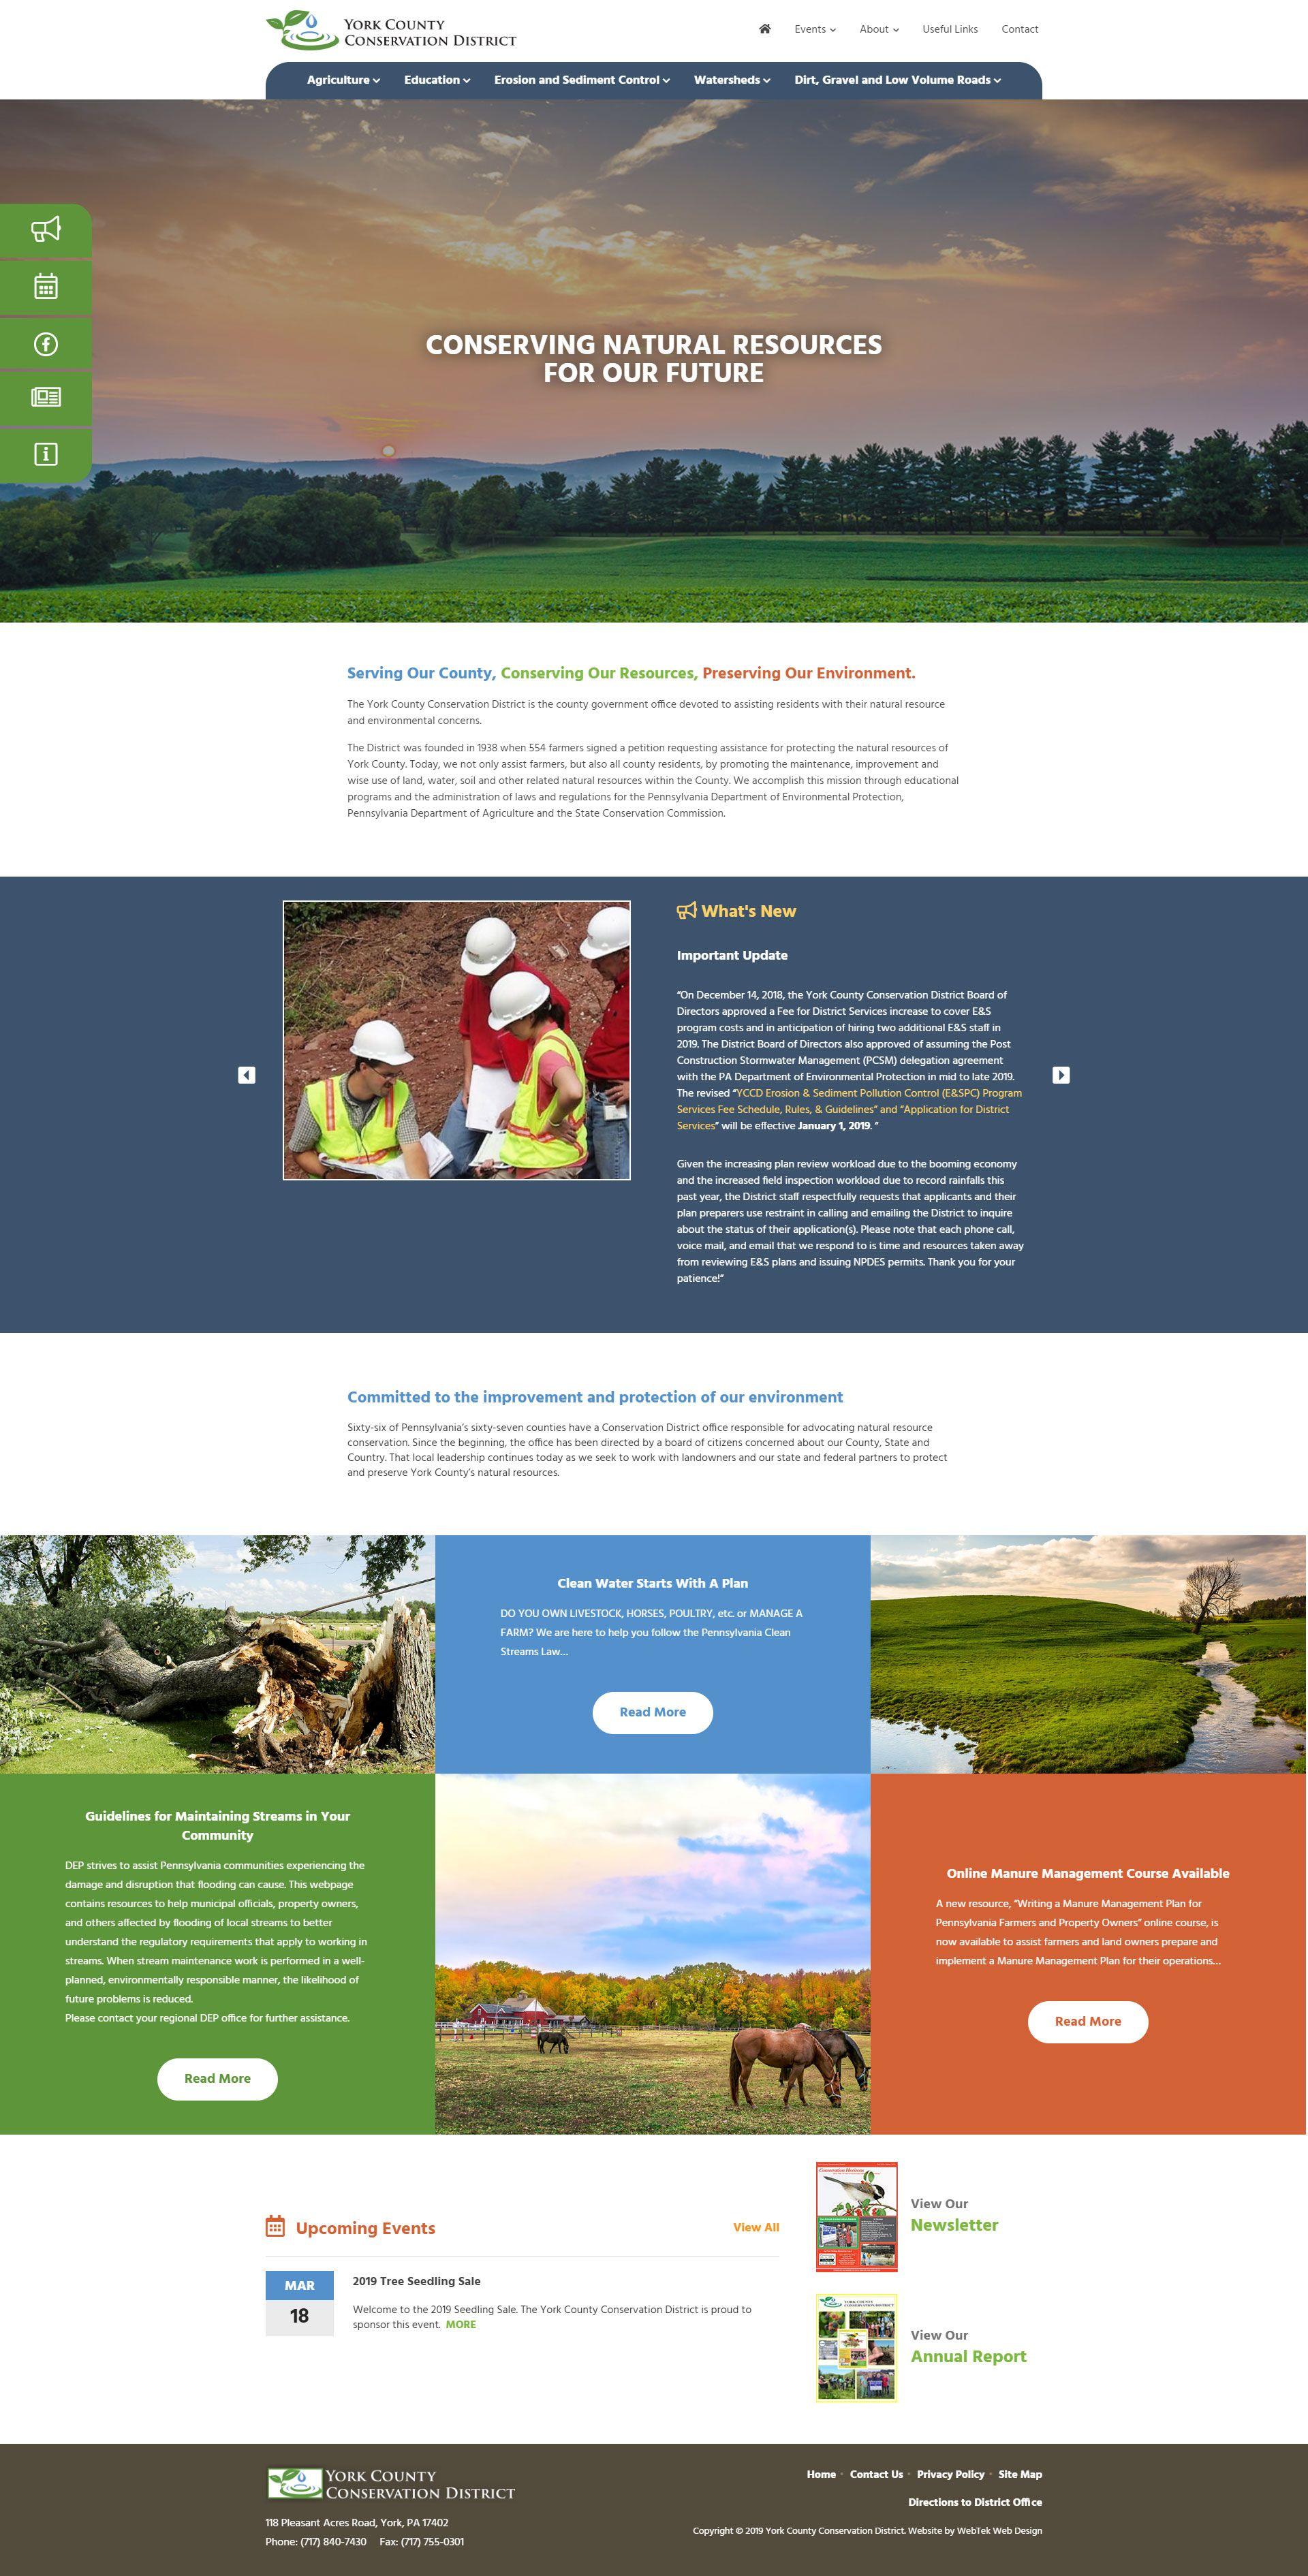 Web Design Examples Modern Website Gallery Webtek Central Pa Web Design Websites Web Design Examples Web Design